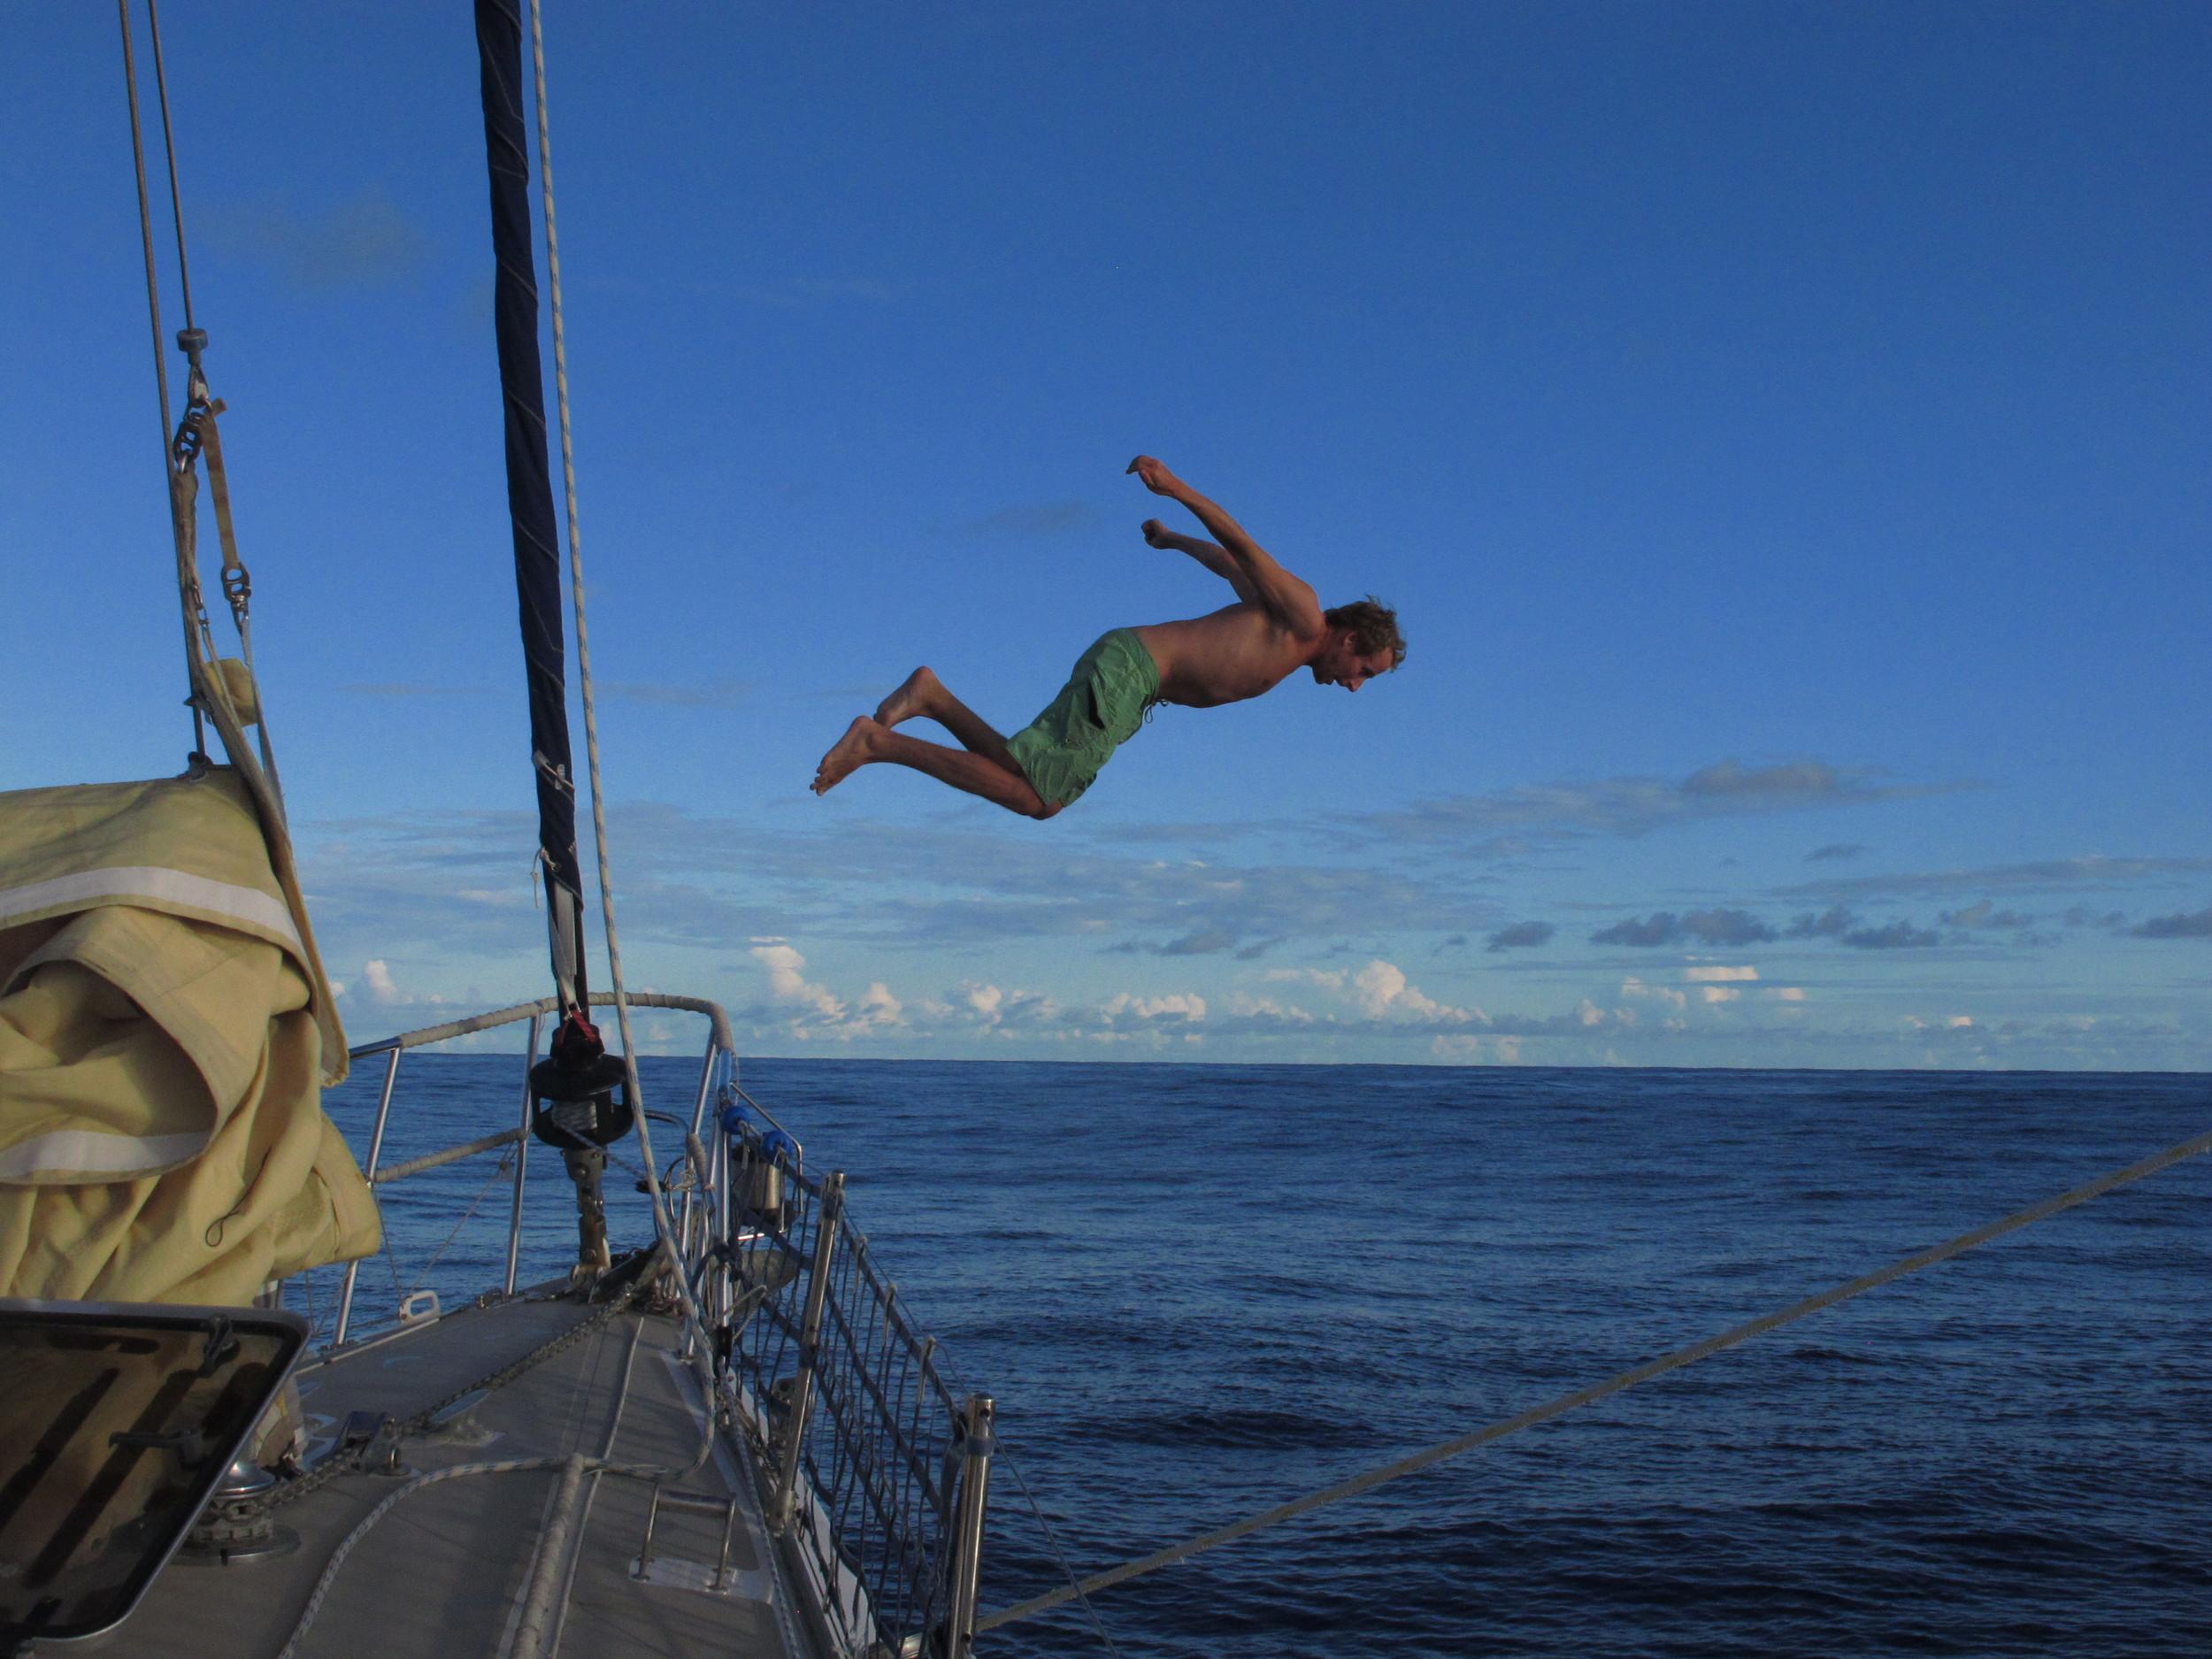 boat_jump.jpeg